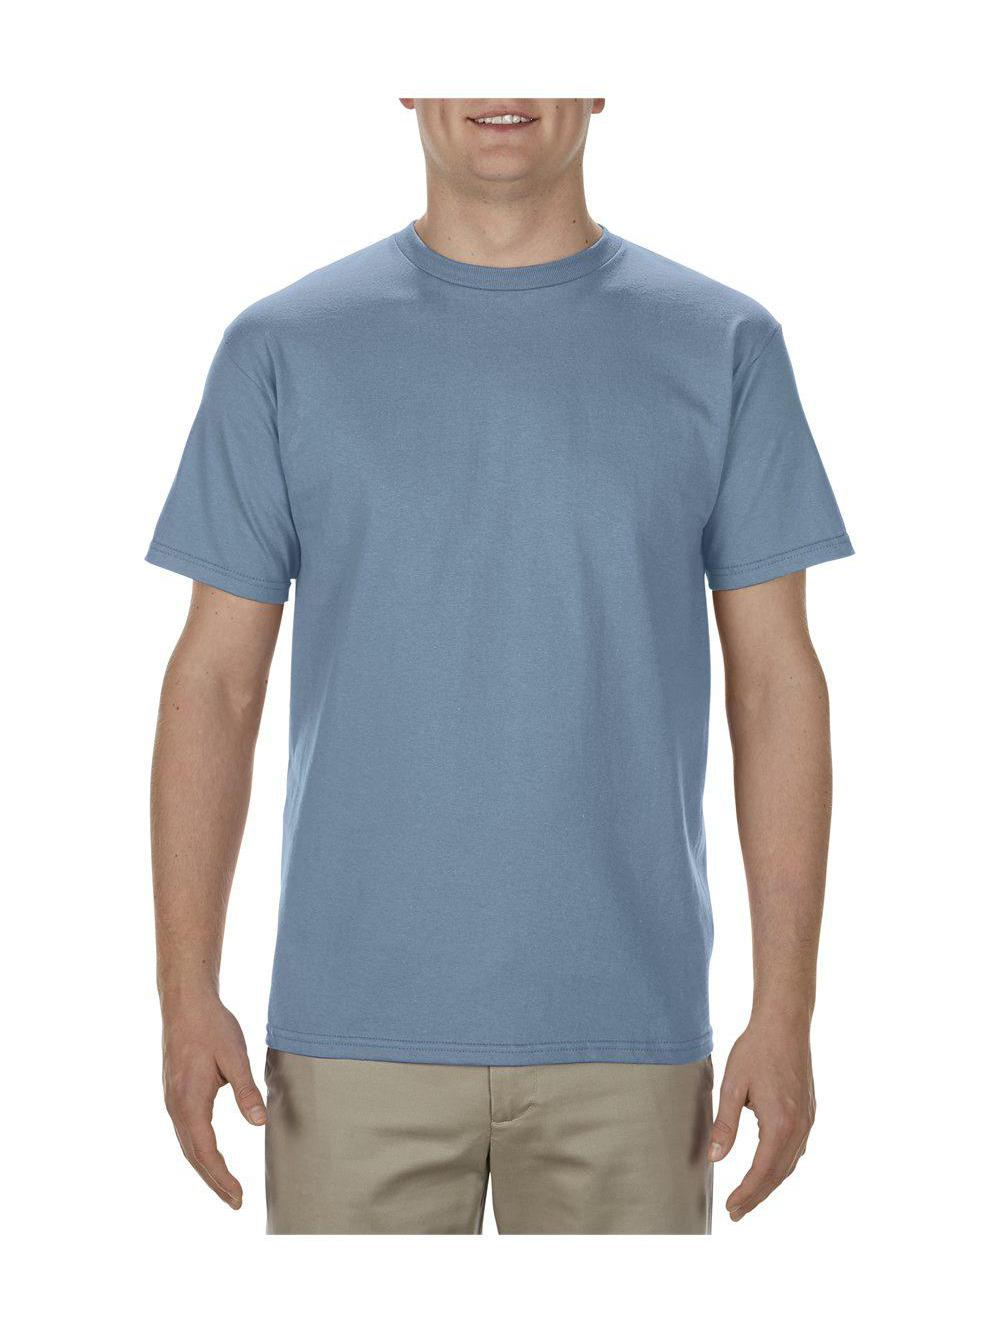 ALSTYLE-Premium-T-Shirt-1701 thumbnail 61